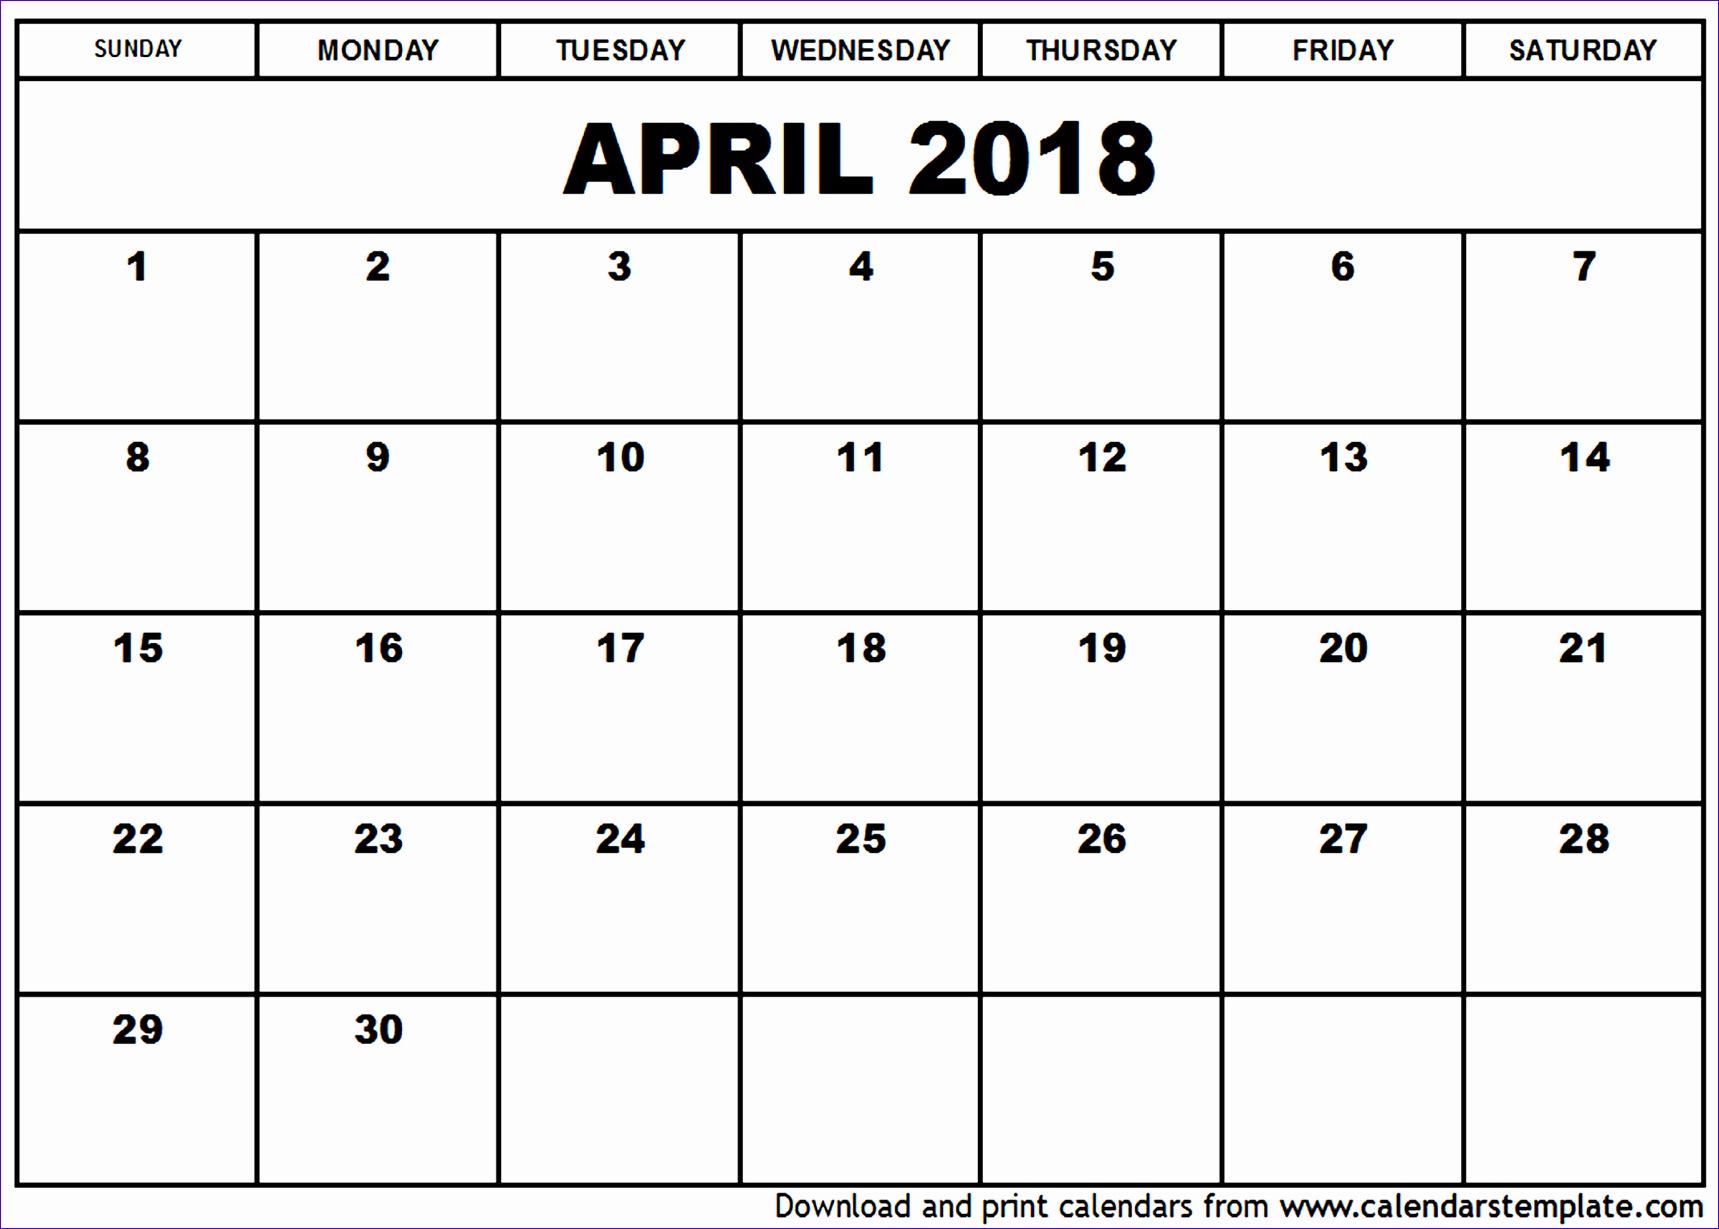 april 2018 calendar template 1848 17191229